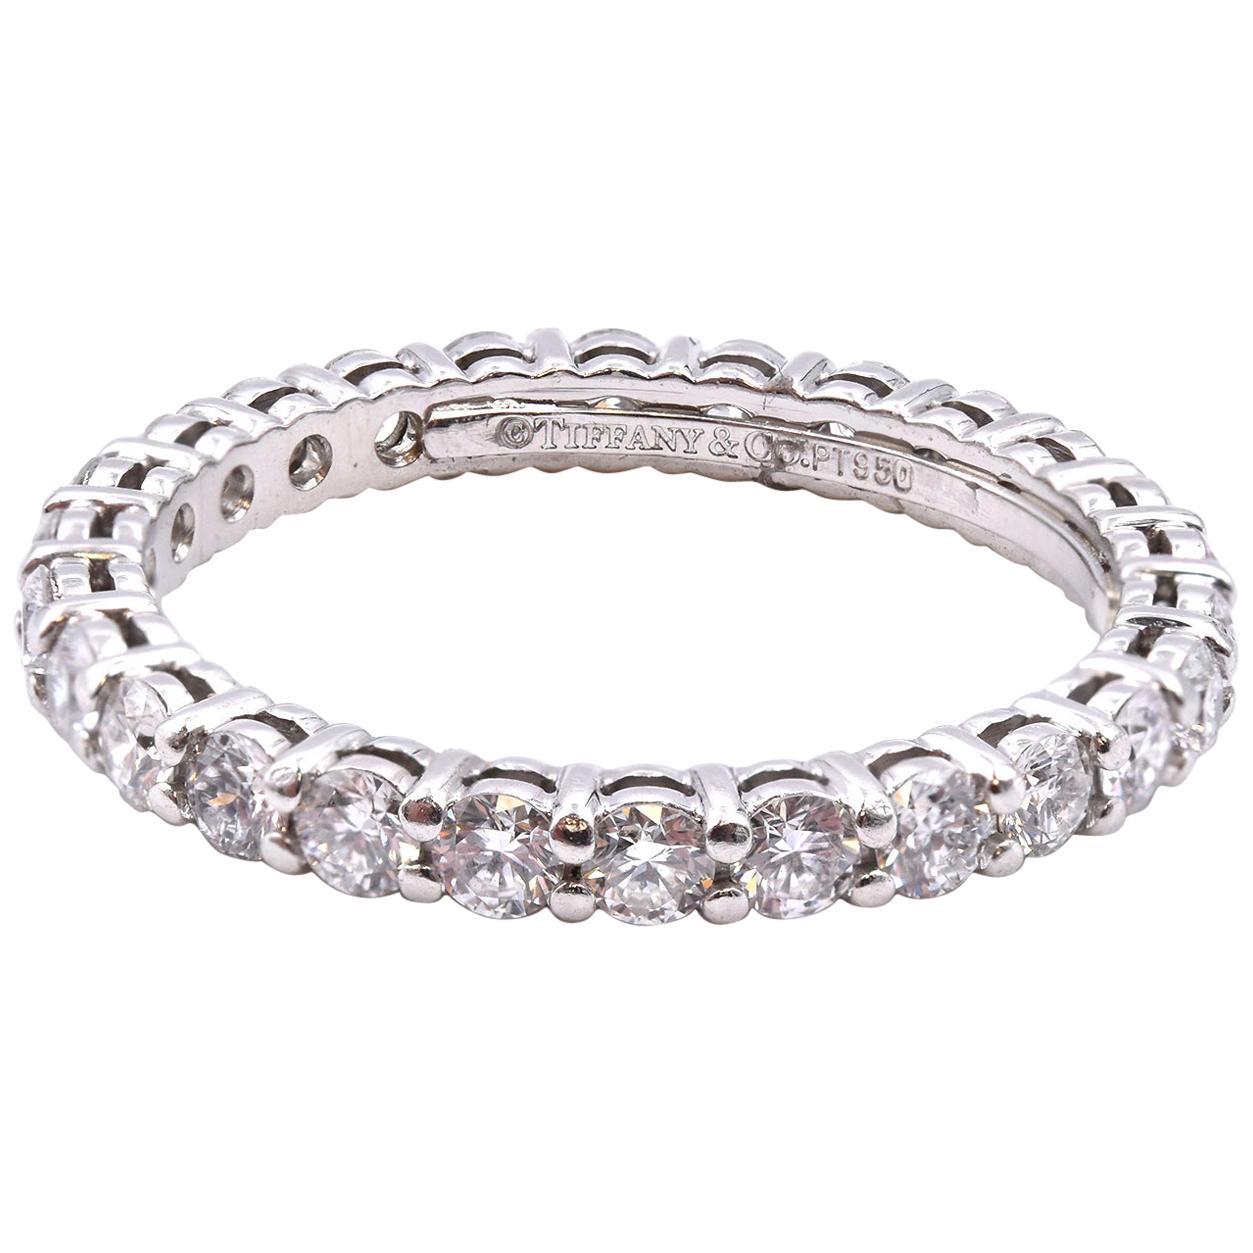 Tiffany & Co. Platinum Diamond Eternity Band